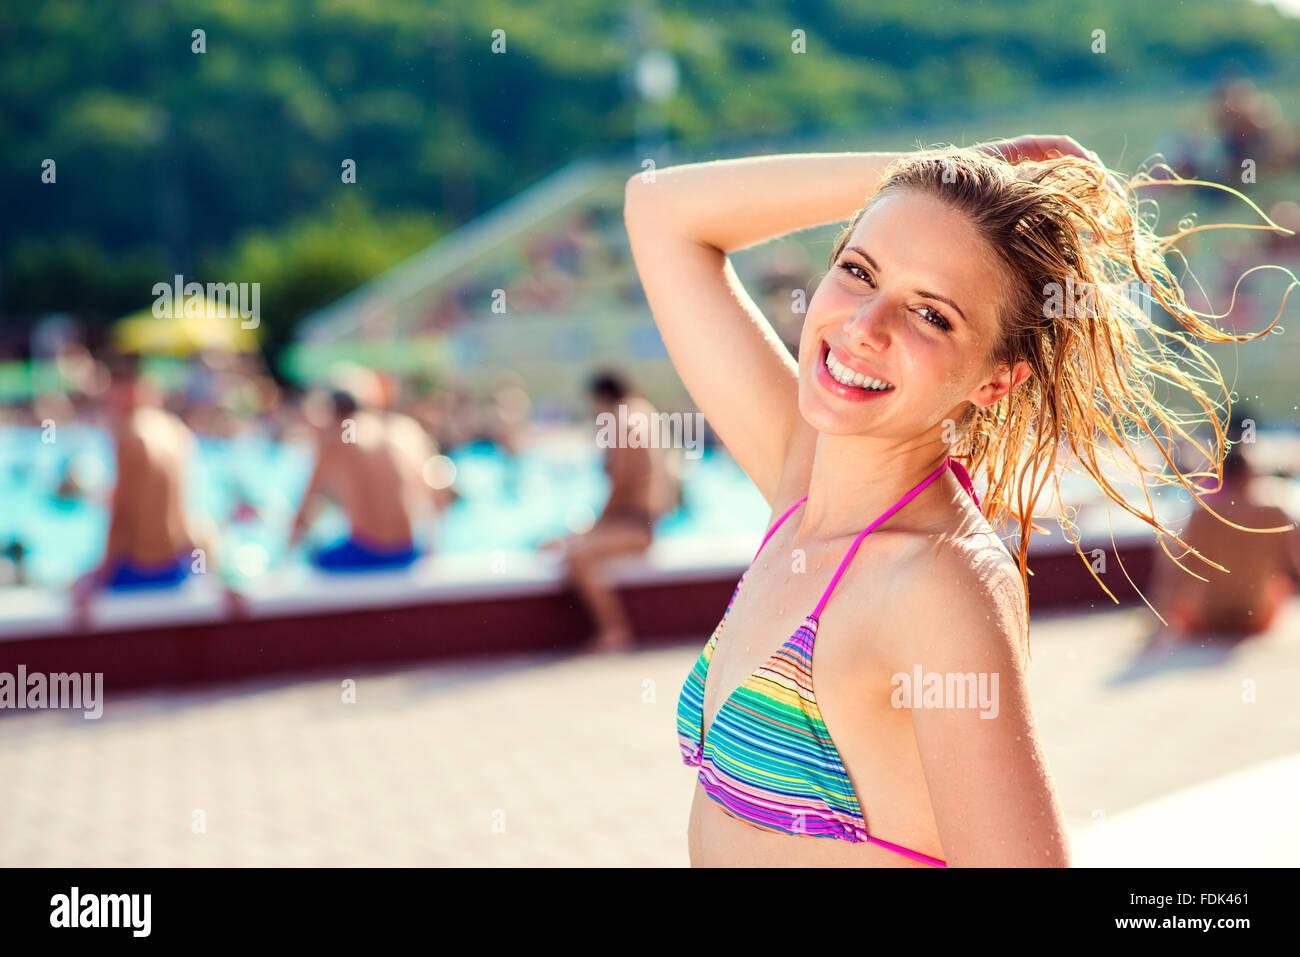 Belle jeune femme dans la piscine Photo Stock